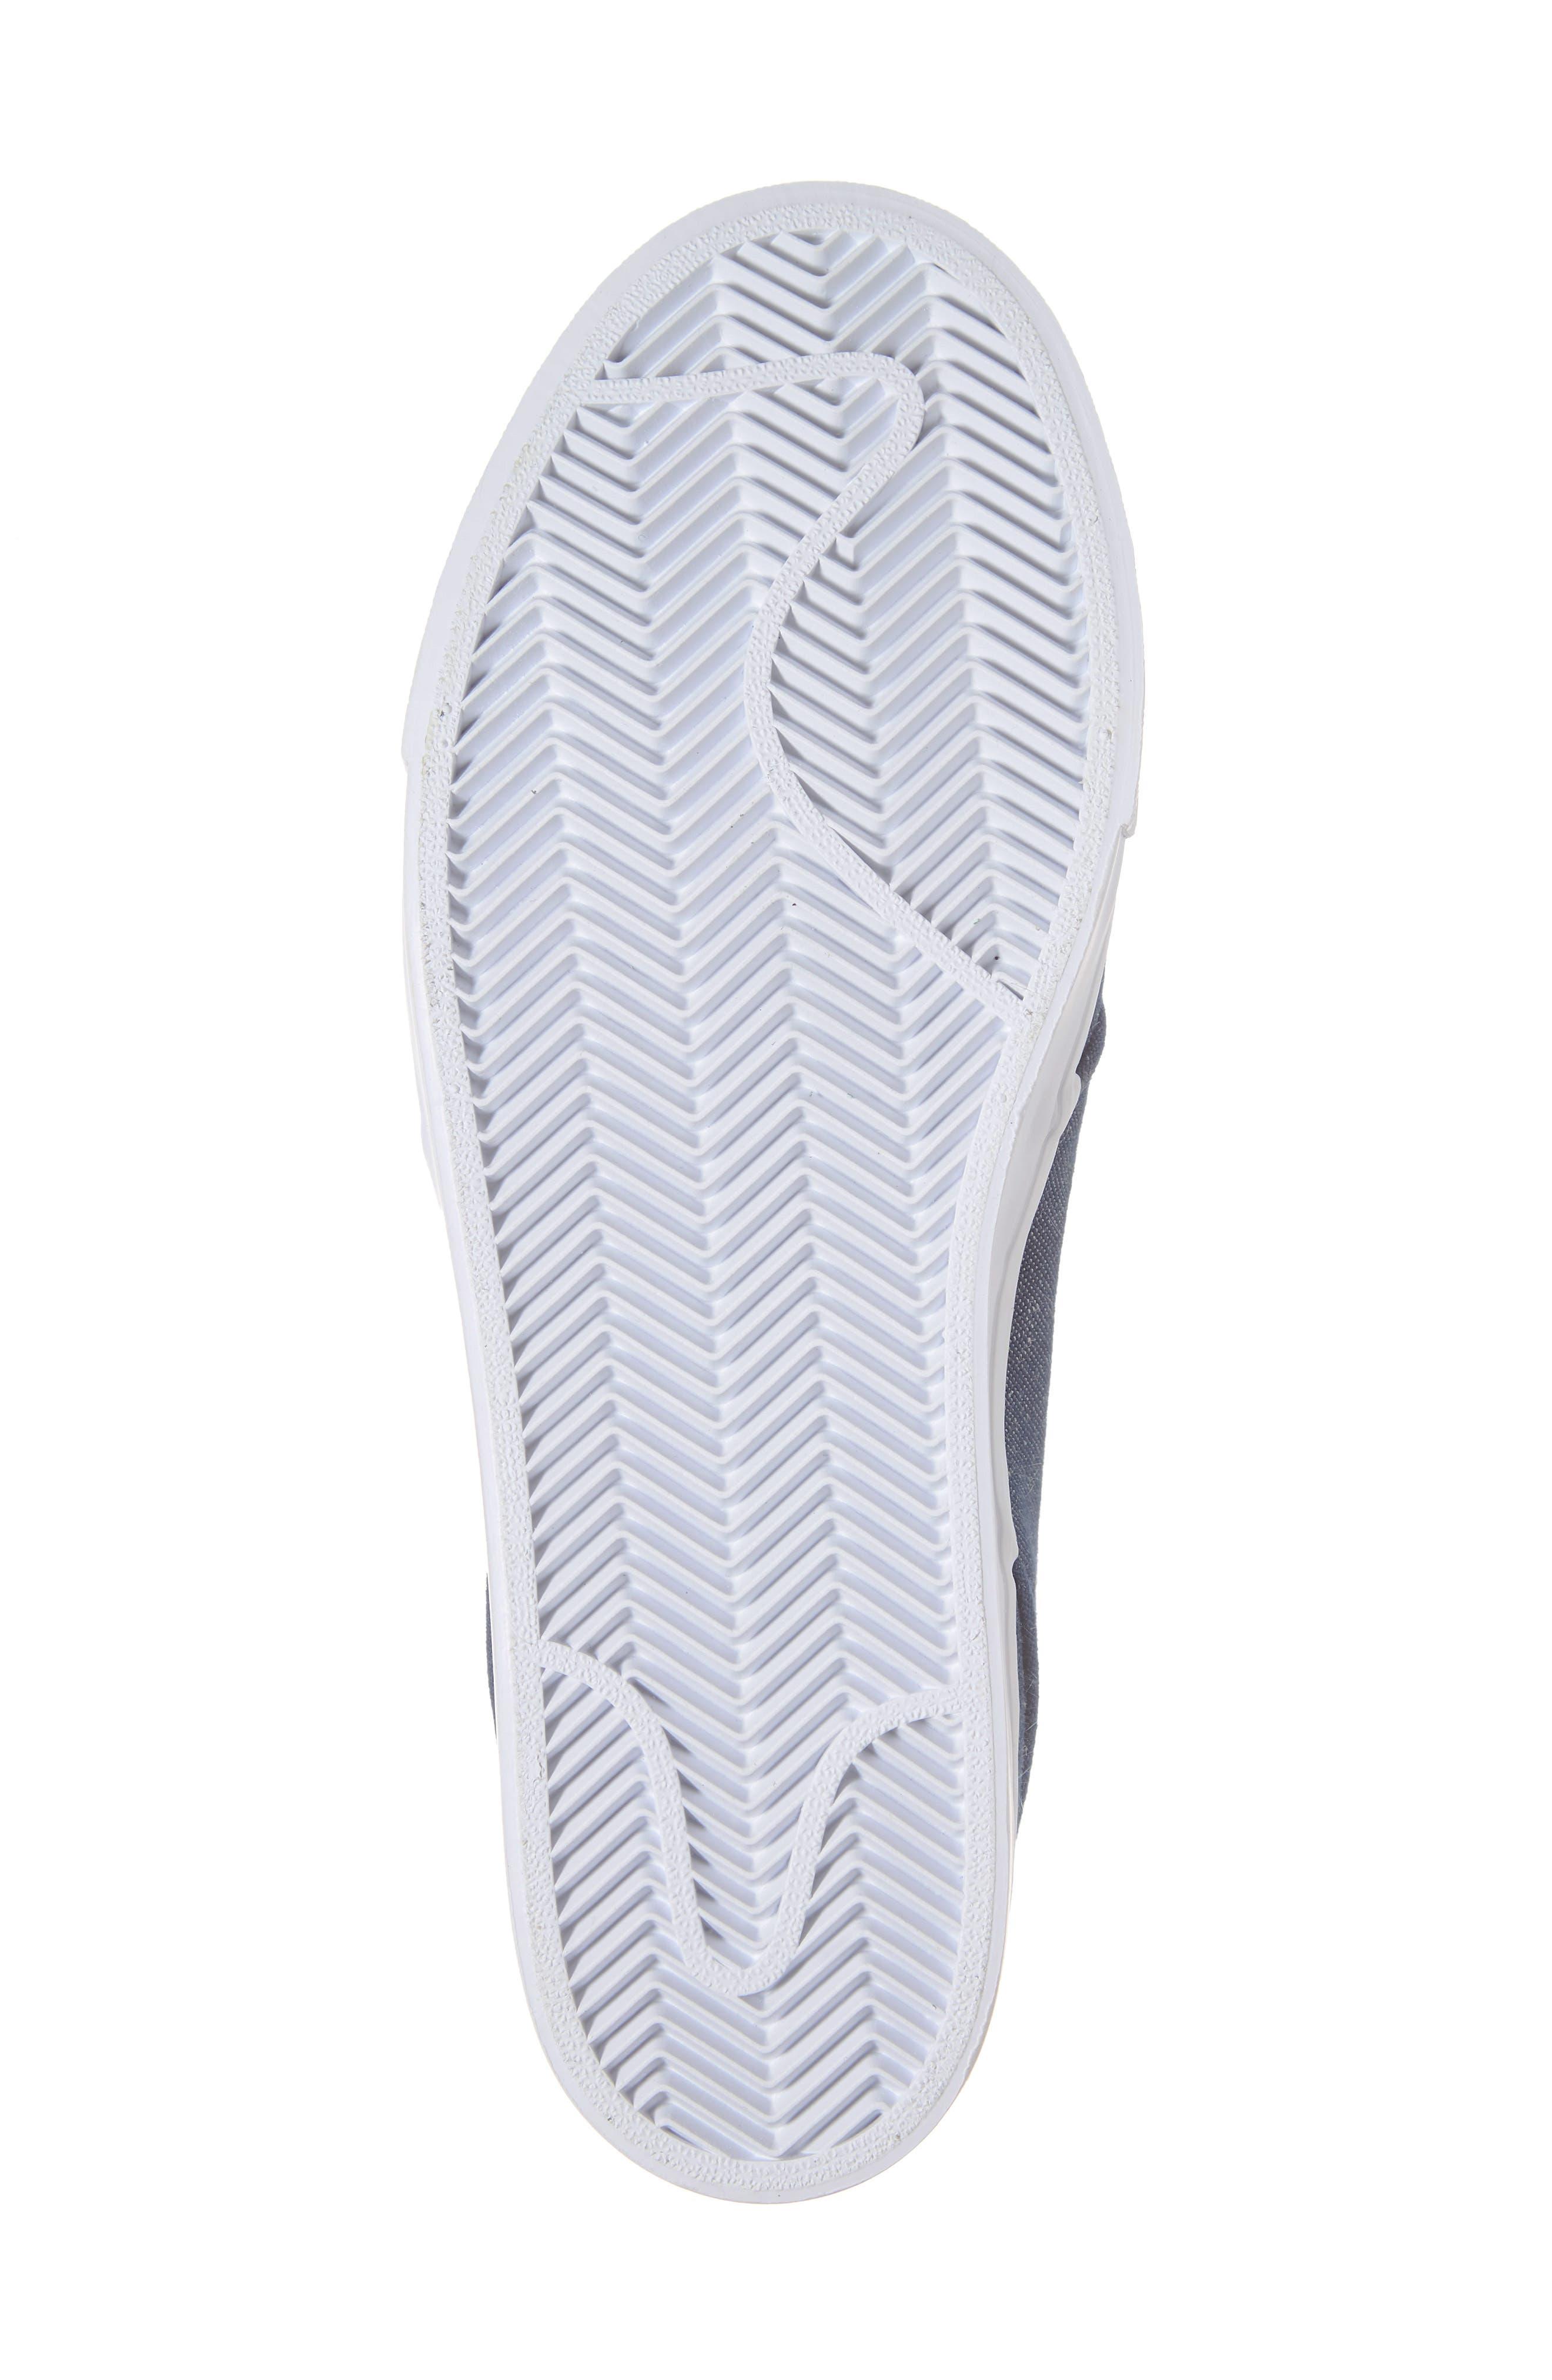 Zoom - Stefan Janoski SB Canvas Skate Shoe,                             Alternate thumbnail 199, color,